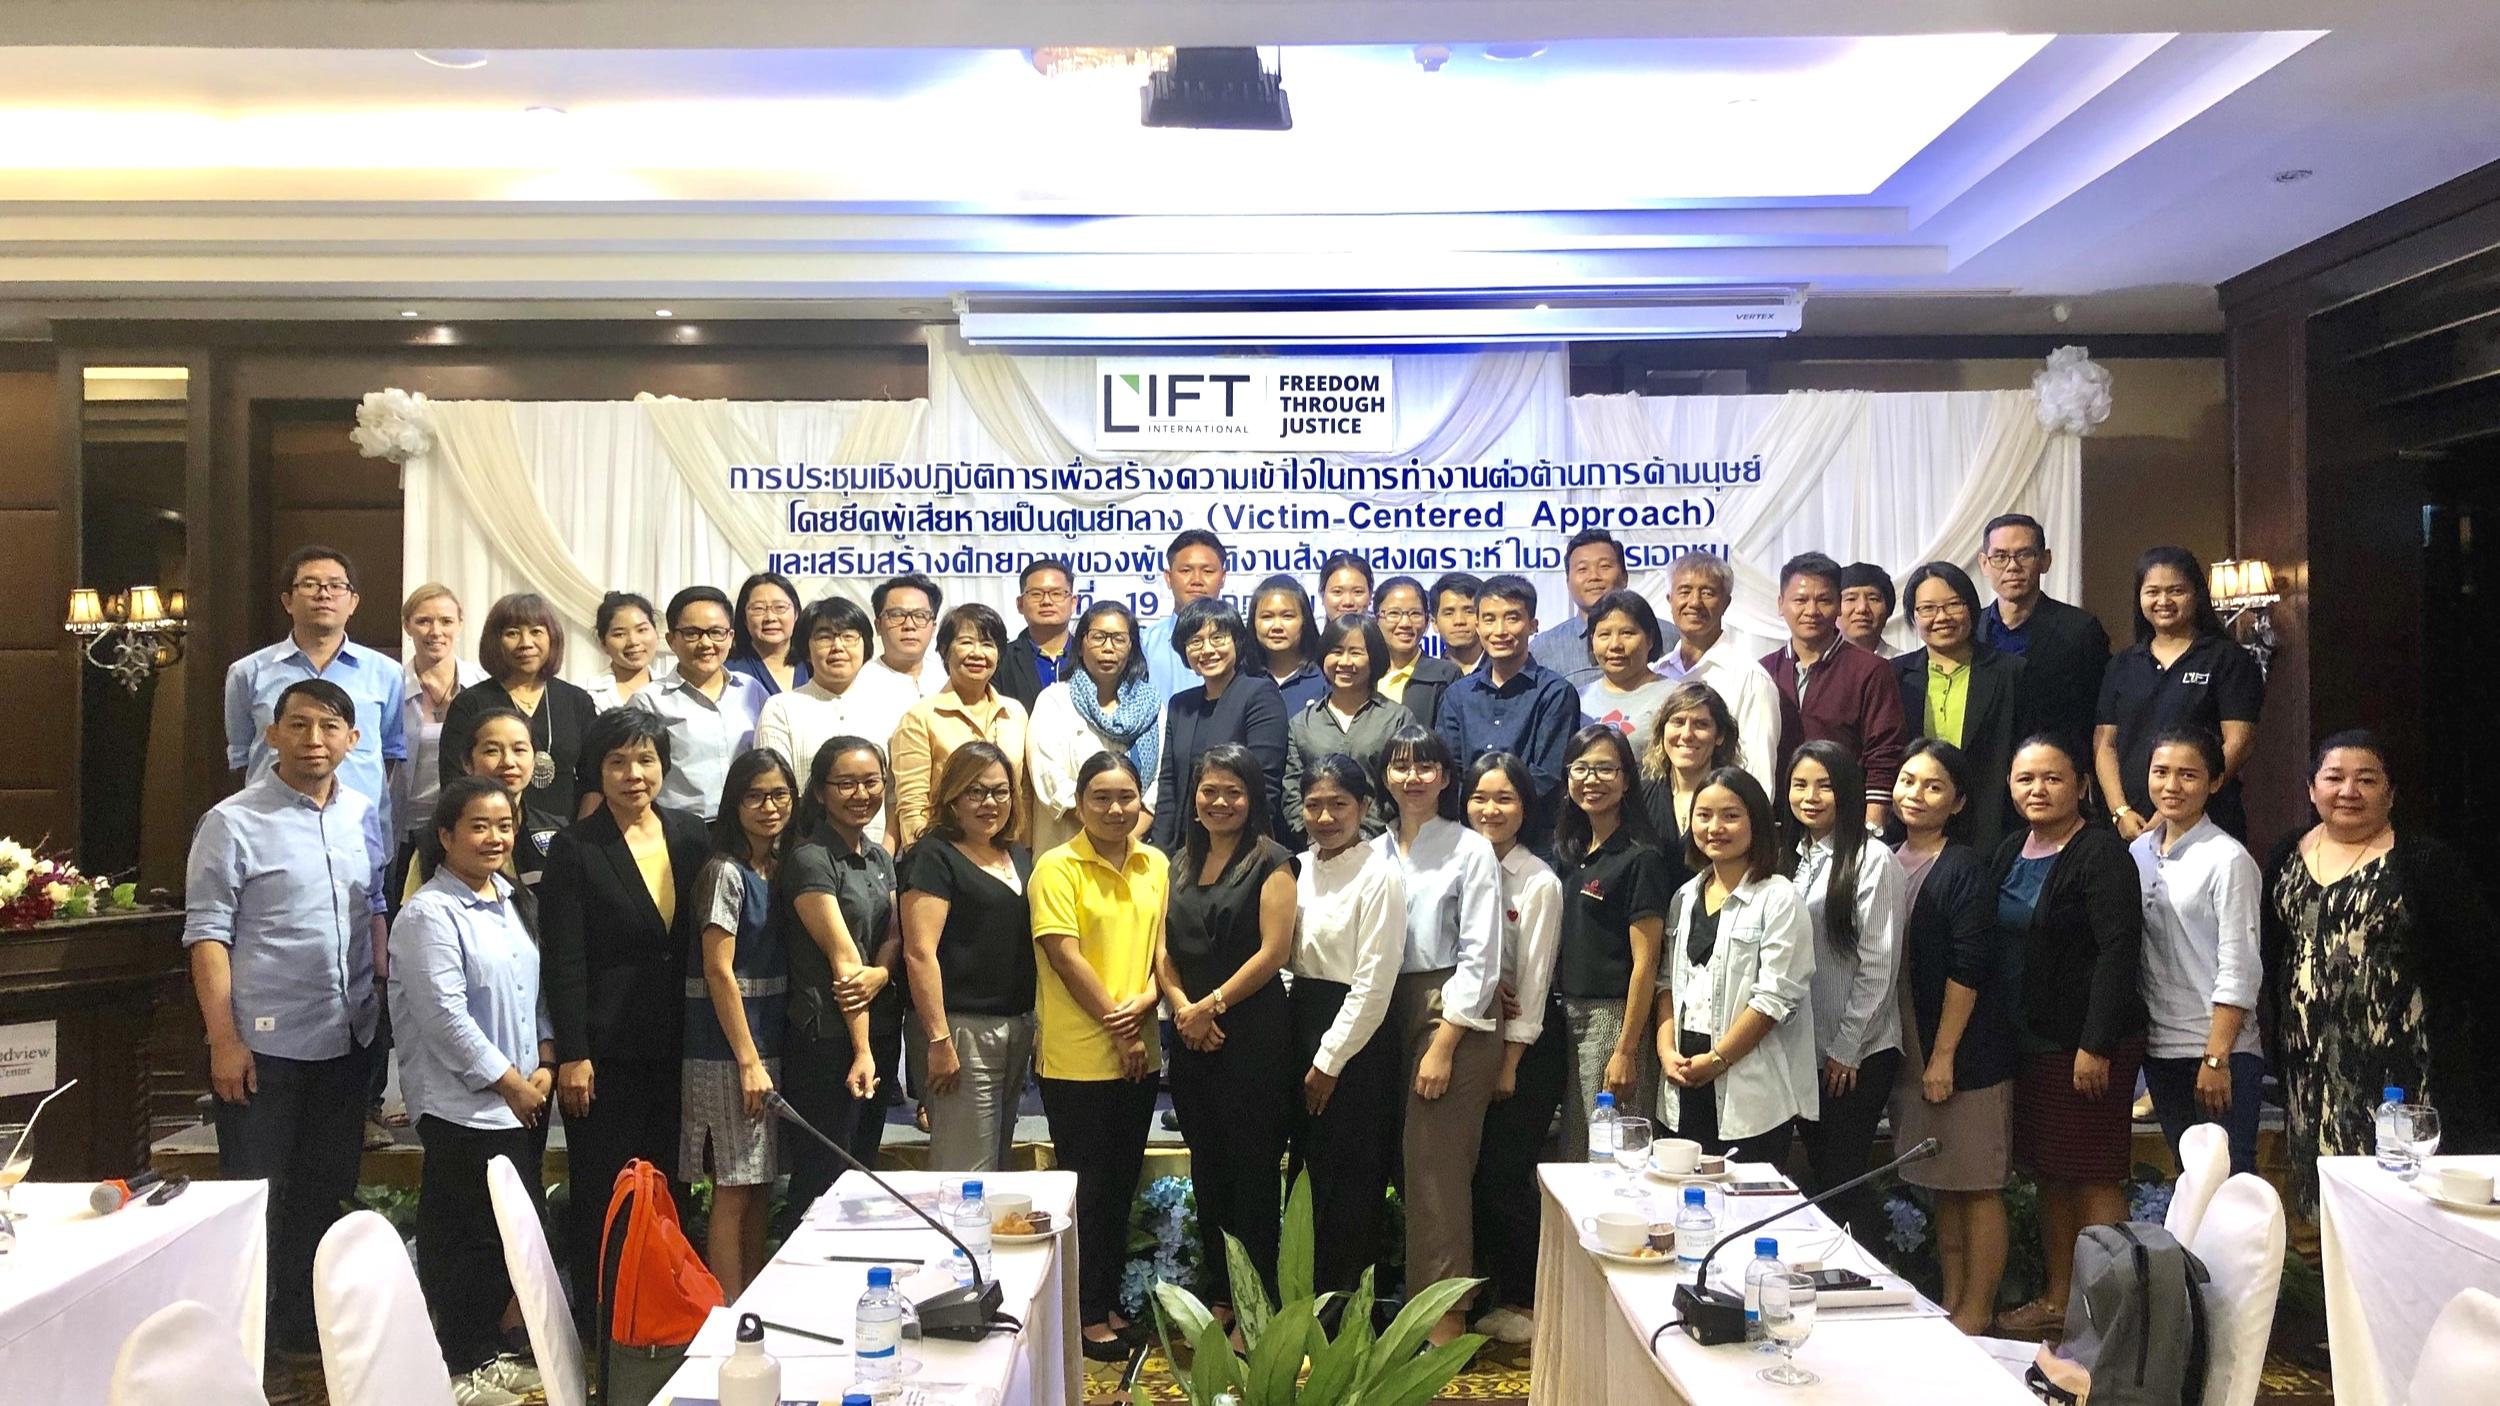 23 organizations represented